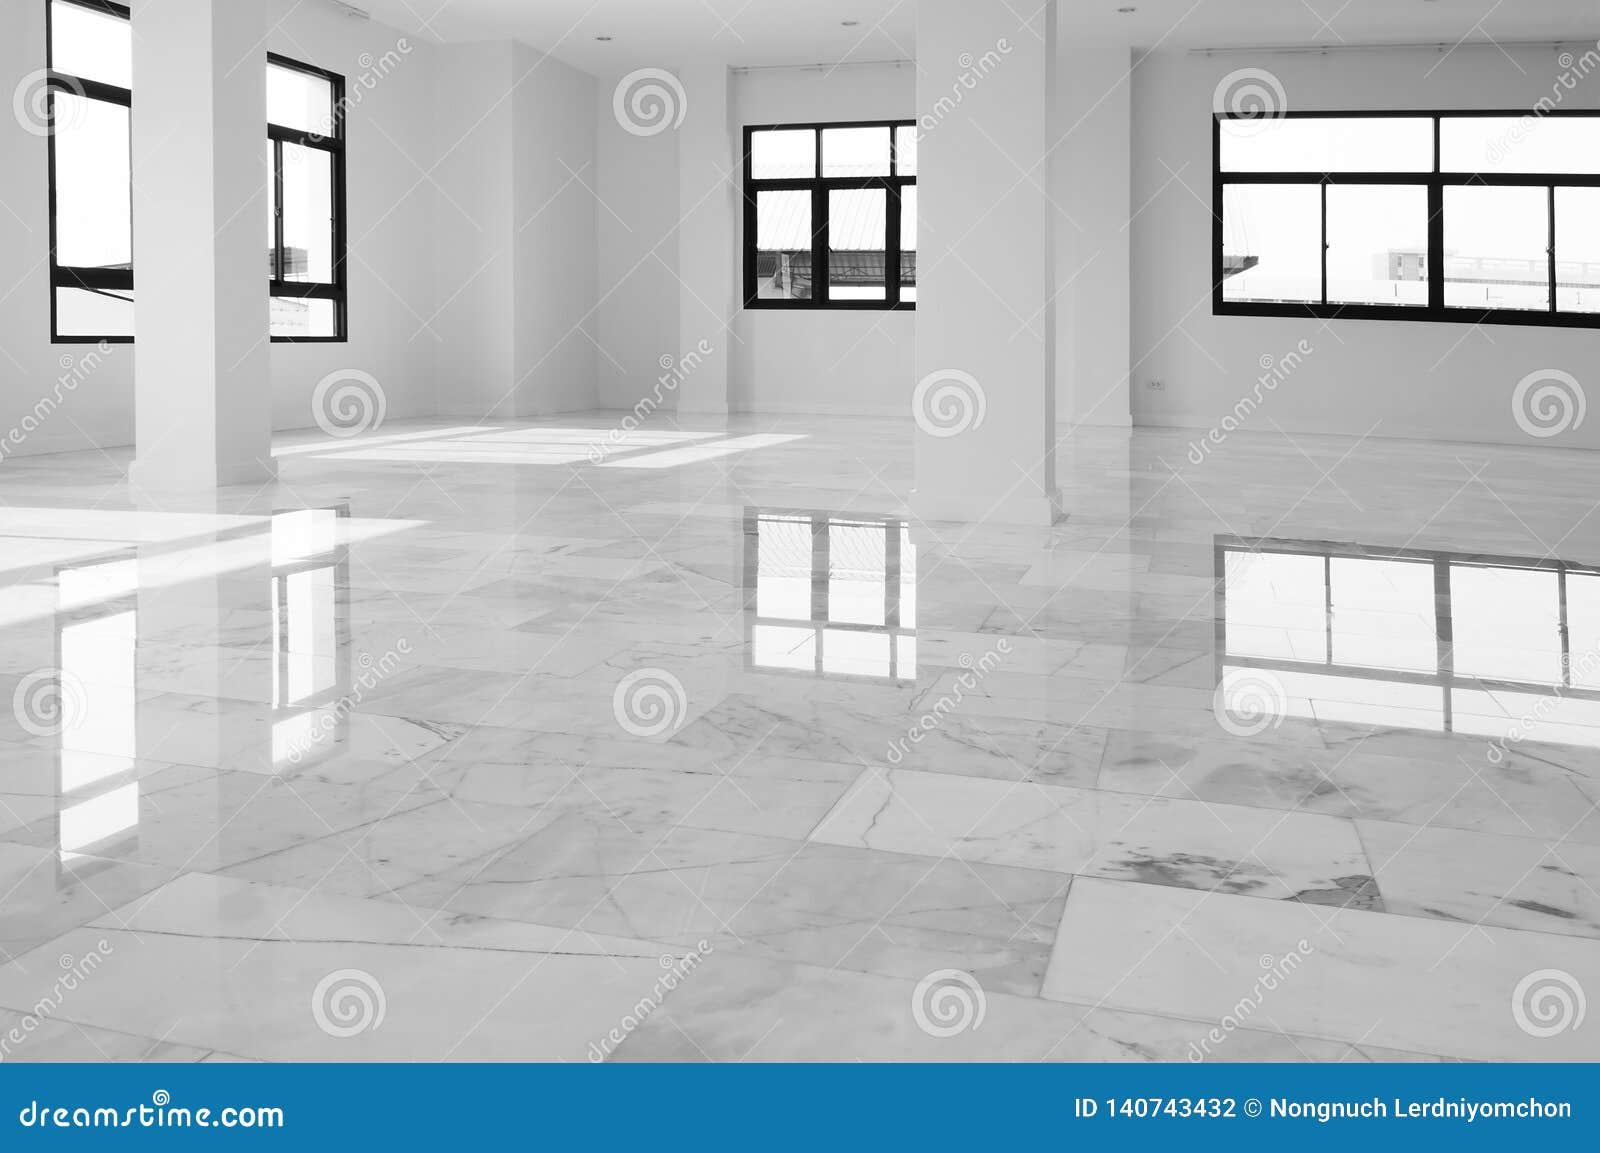 Interior Of Empty Apartment Wide Room With Marble Floor White With Grey Marble Floor Interior Background White Marble Quartz Textu Stock Photo Image Of Grey Black 140743432